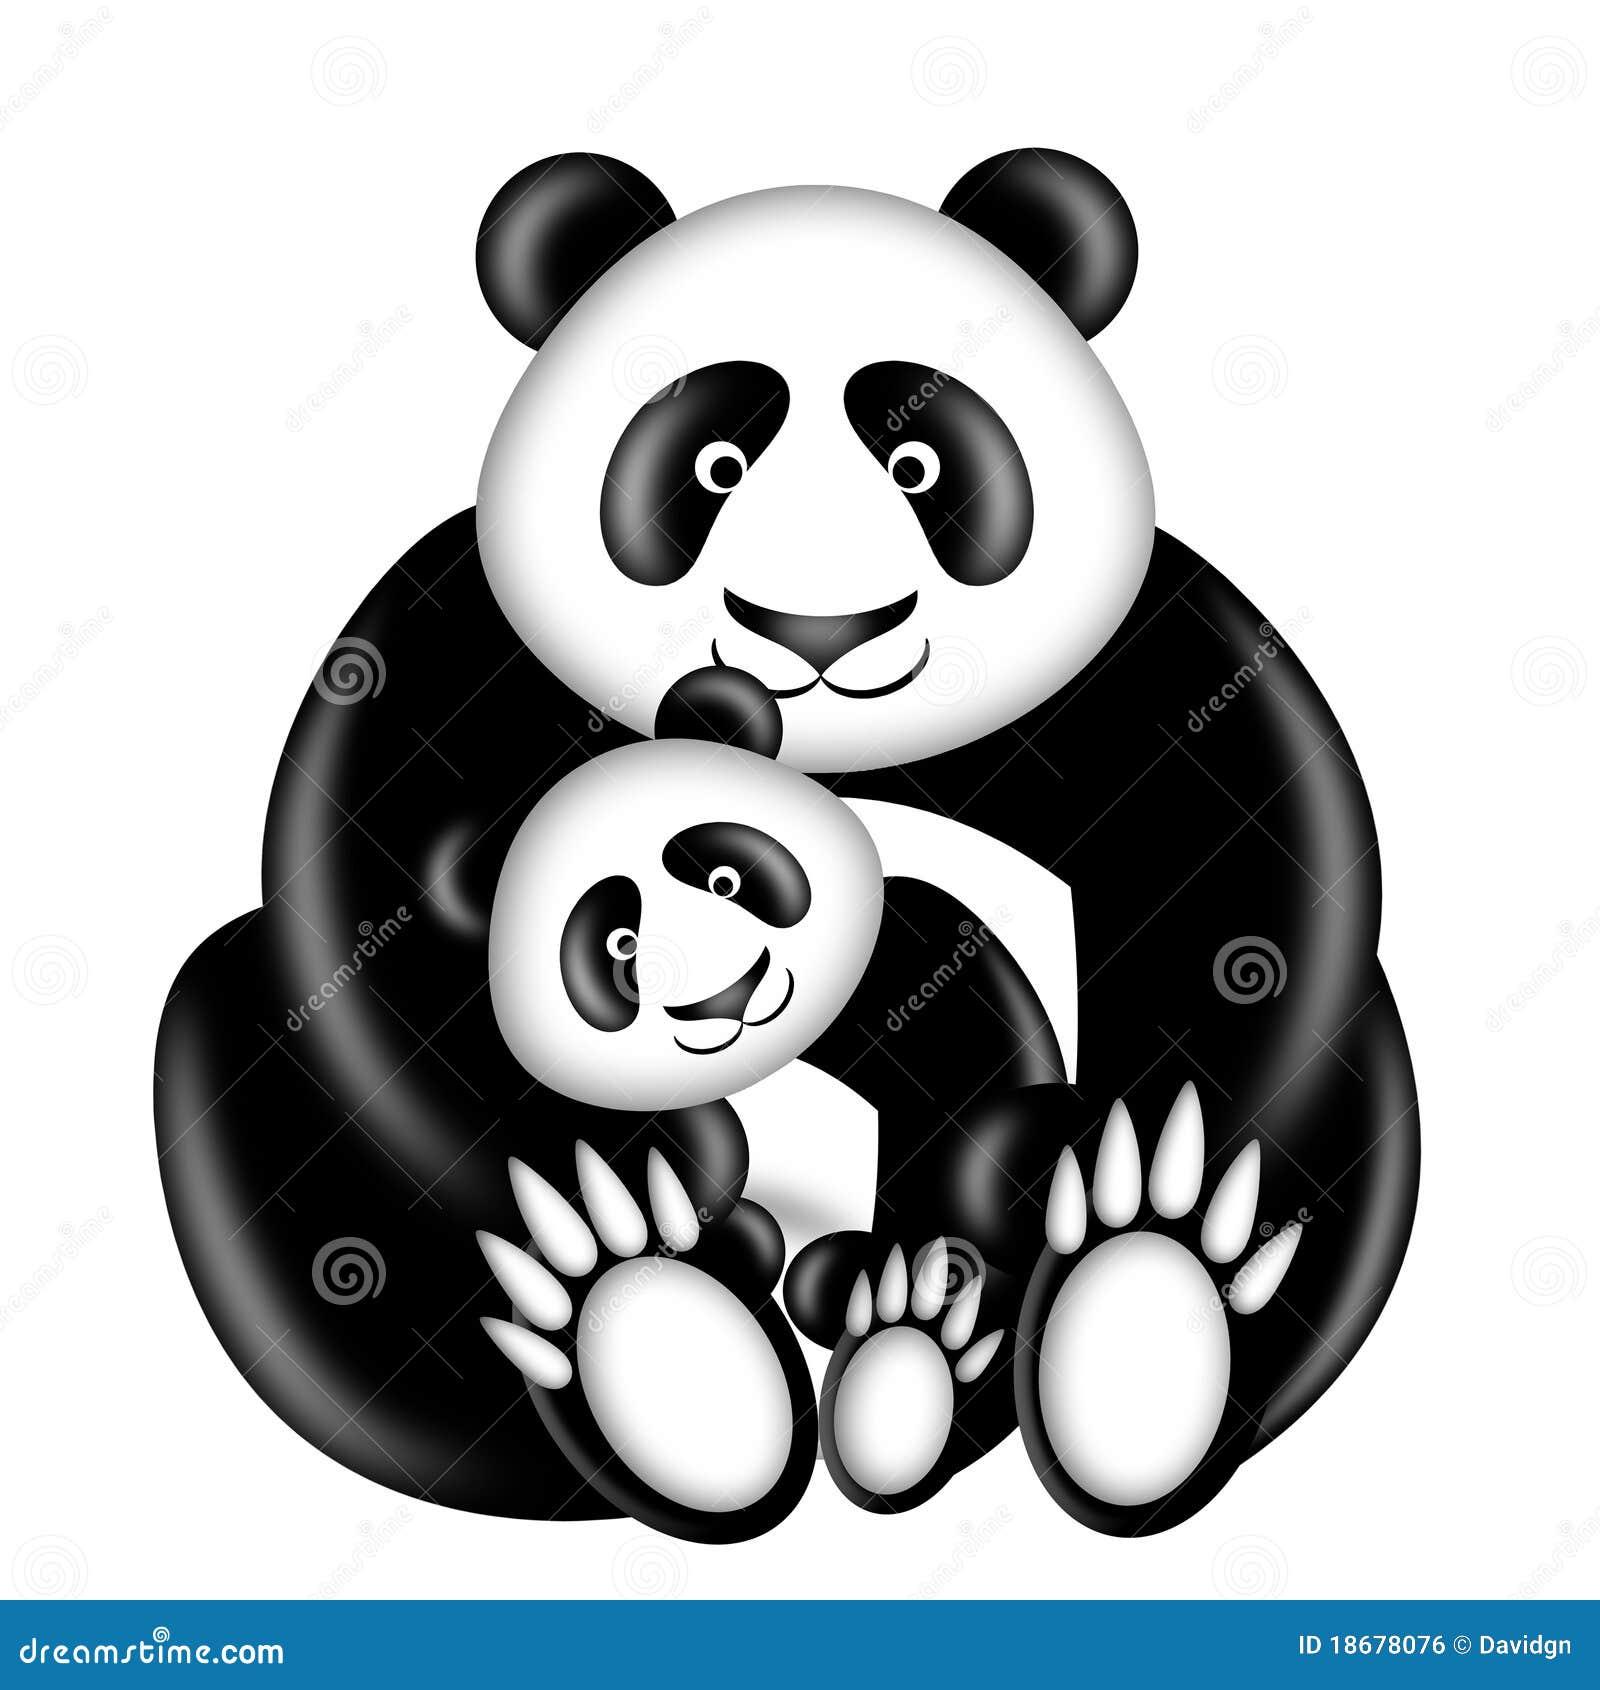 clipart panda dad - photo #28